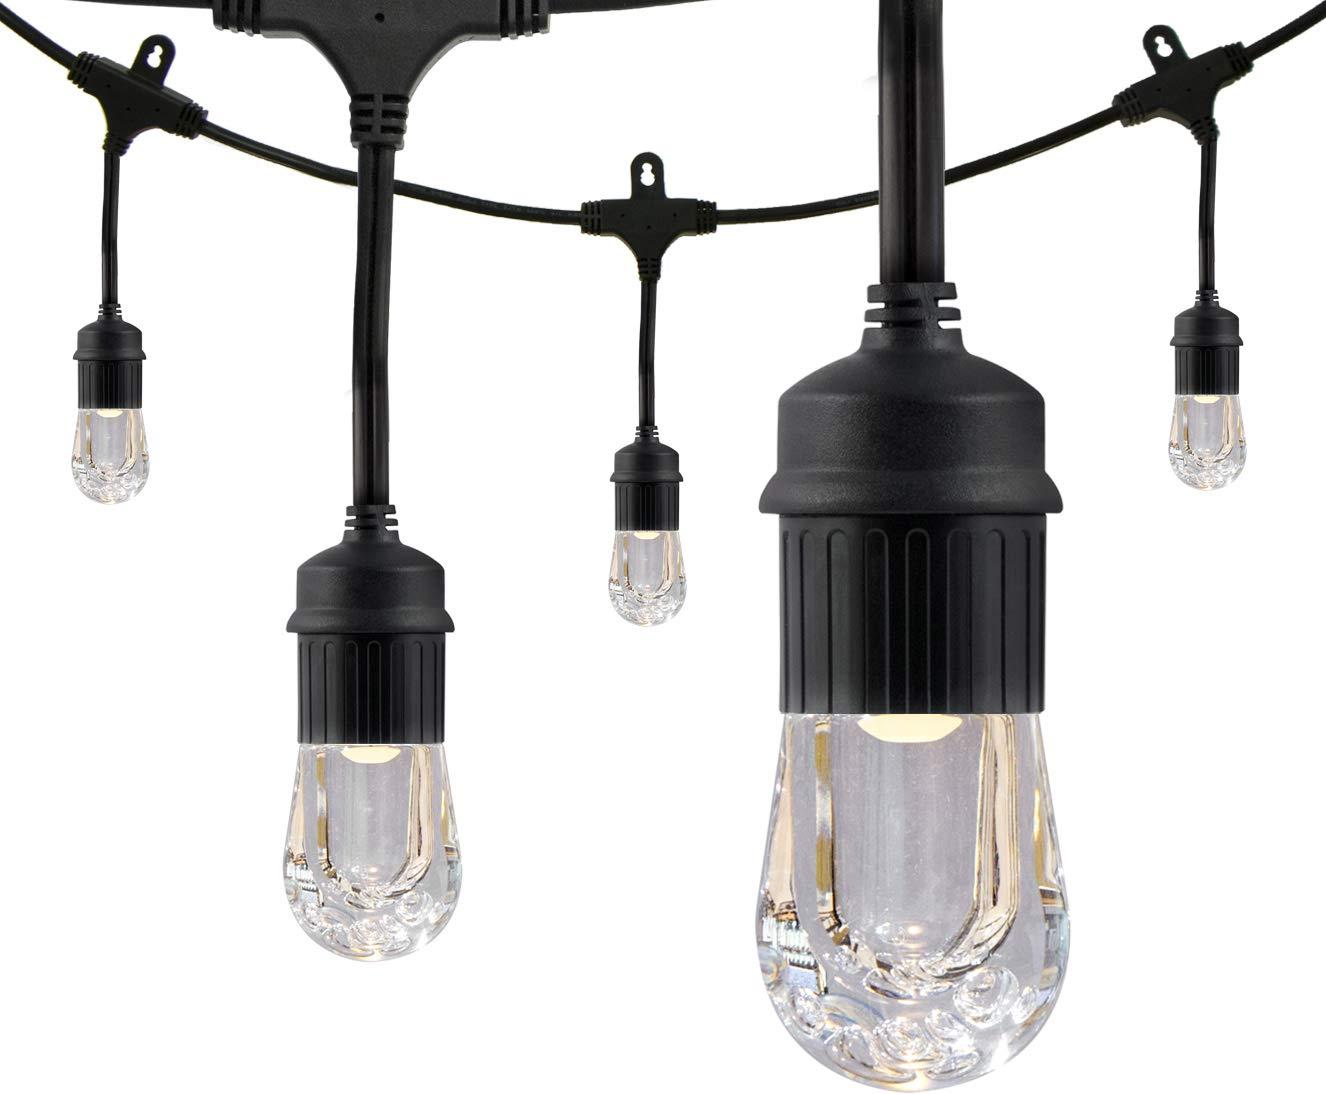 Enbrighten Classic LED Cafe String Lights, Black, 36 Foot Length, 18 Impact Resistant Lifetime Bulbs, Premium, Shatterproof, Weatherproof, Indoor/Outdoor, Commercial Grade, UL Listed, 33171 by Enbrighten